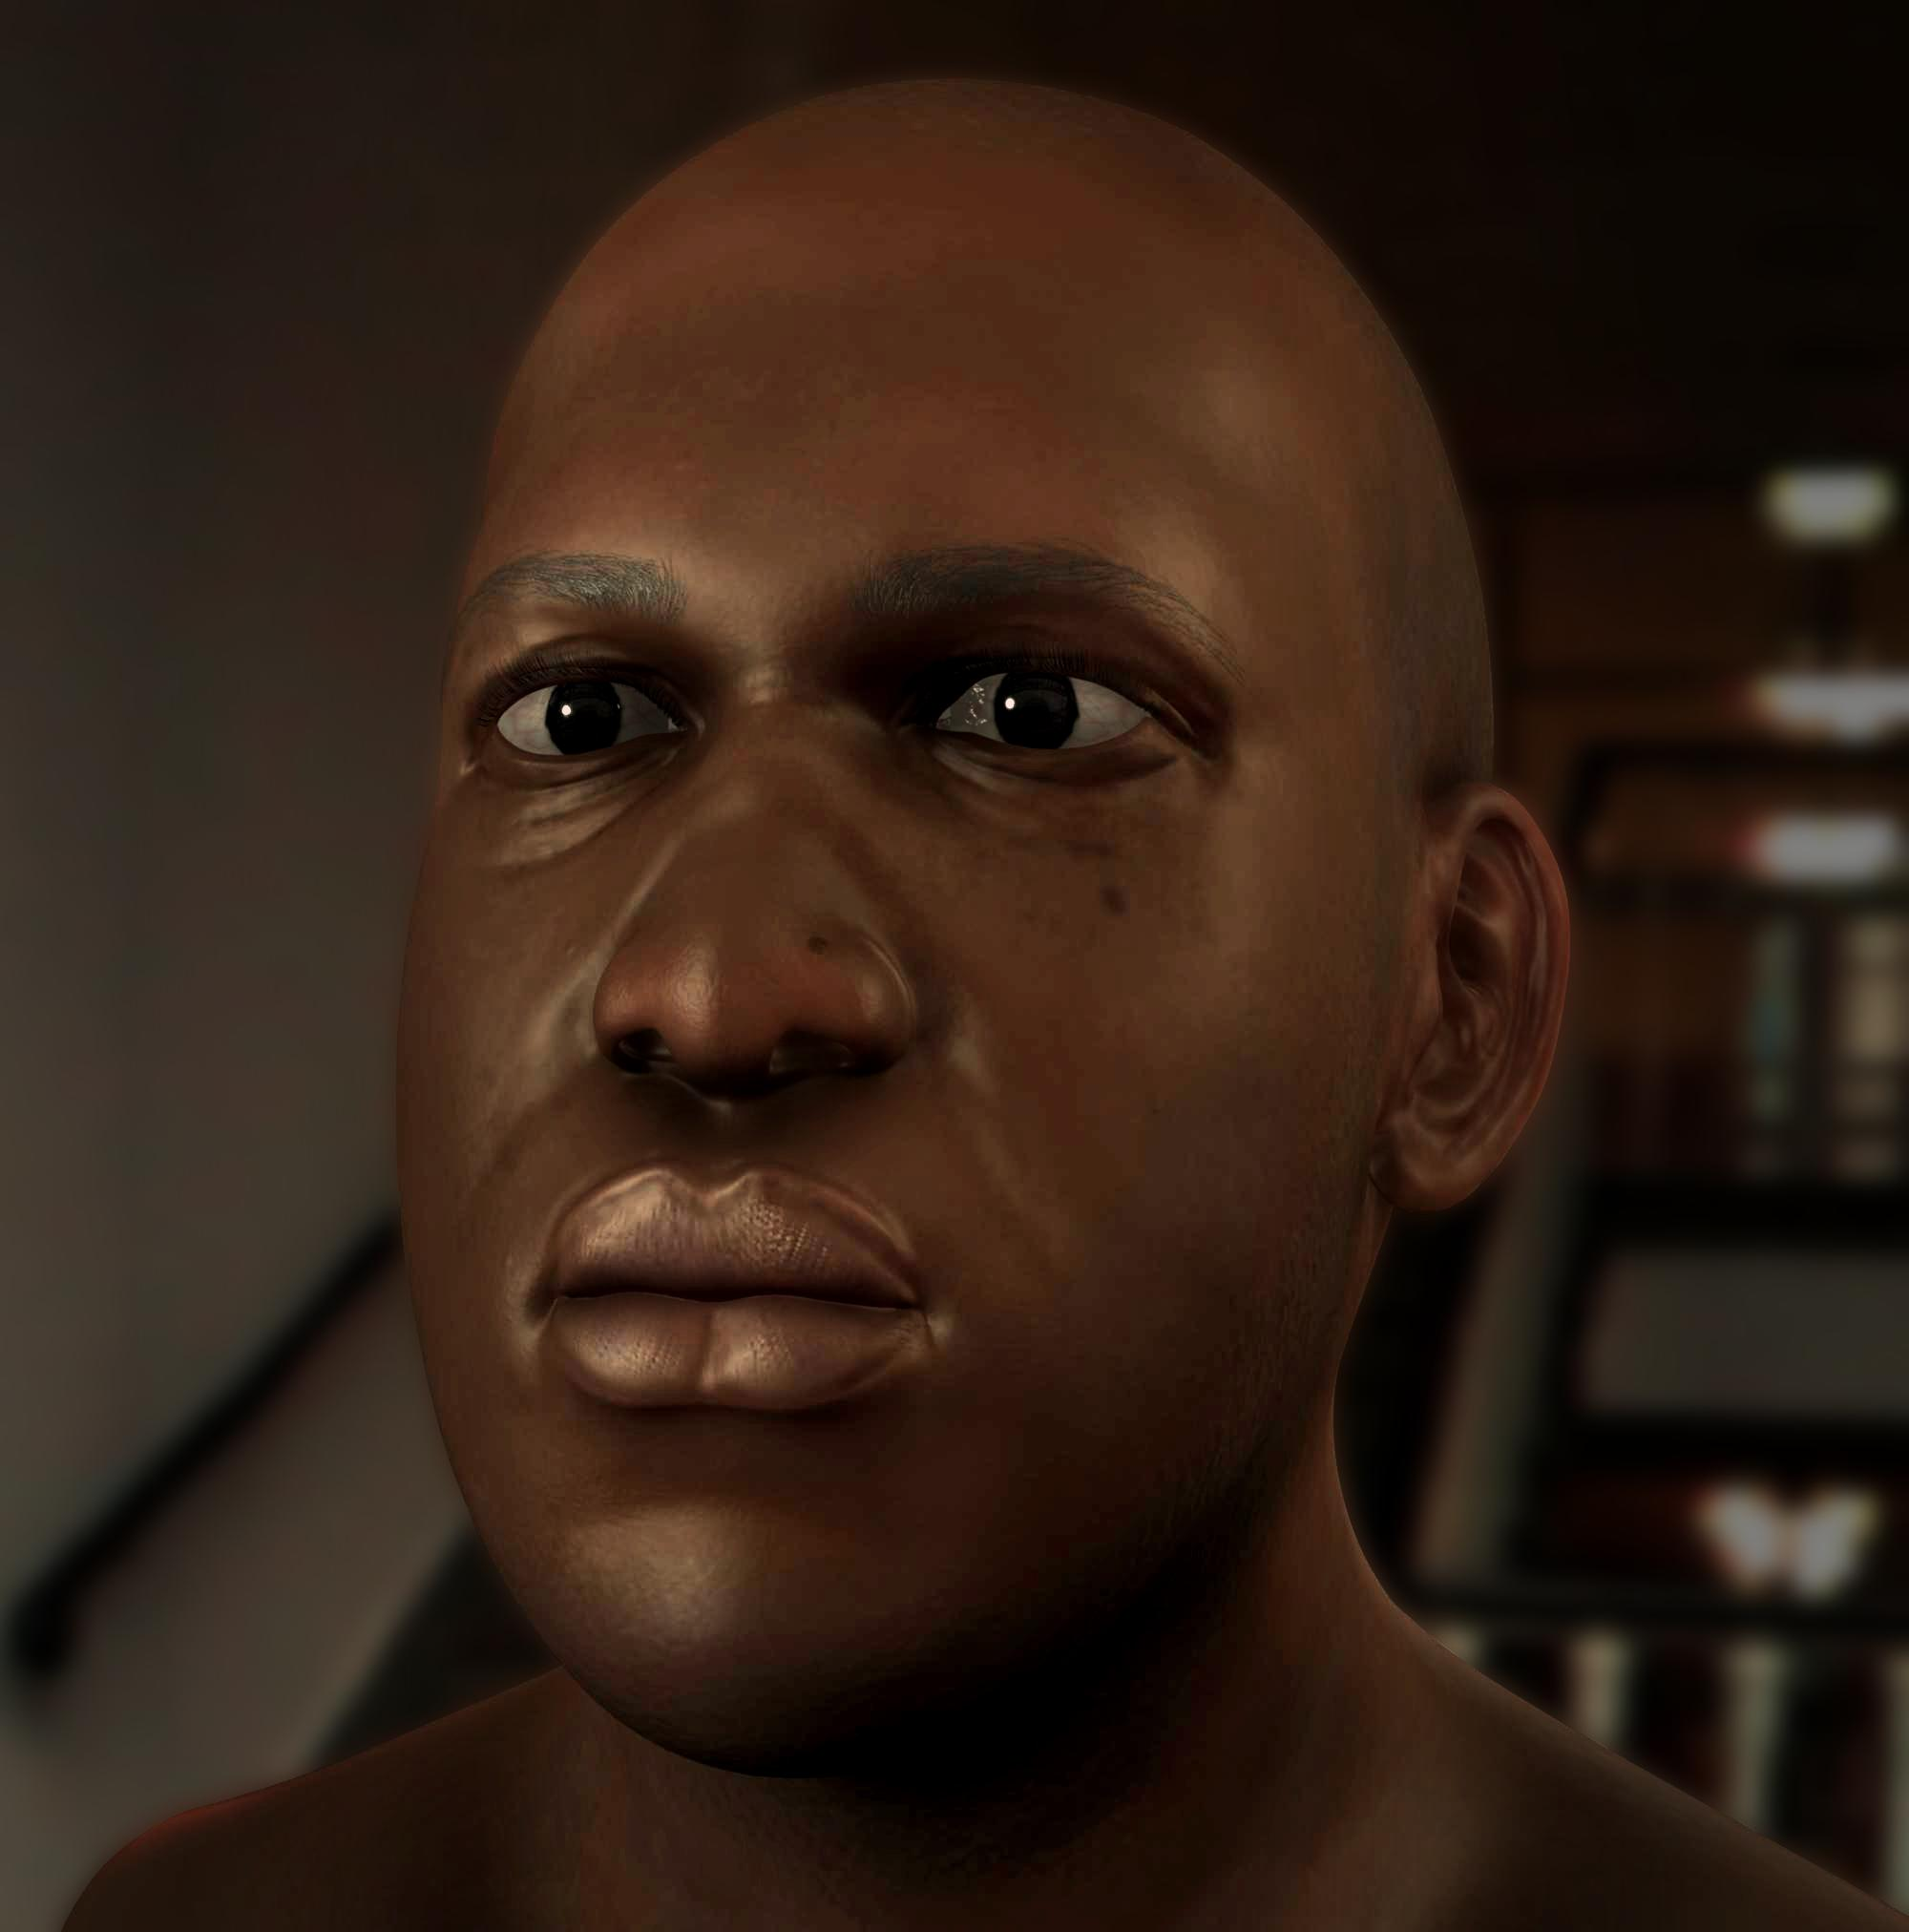 Intento render realista de cabeza humana-compo_kbt_final3.00000.jpg